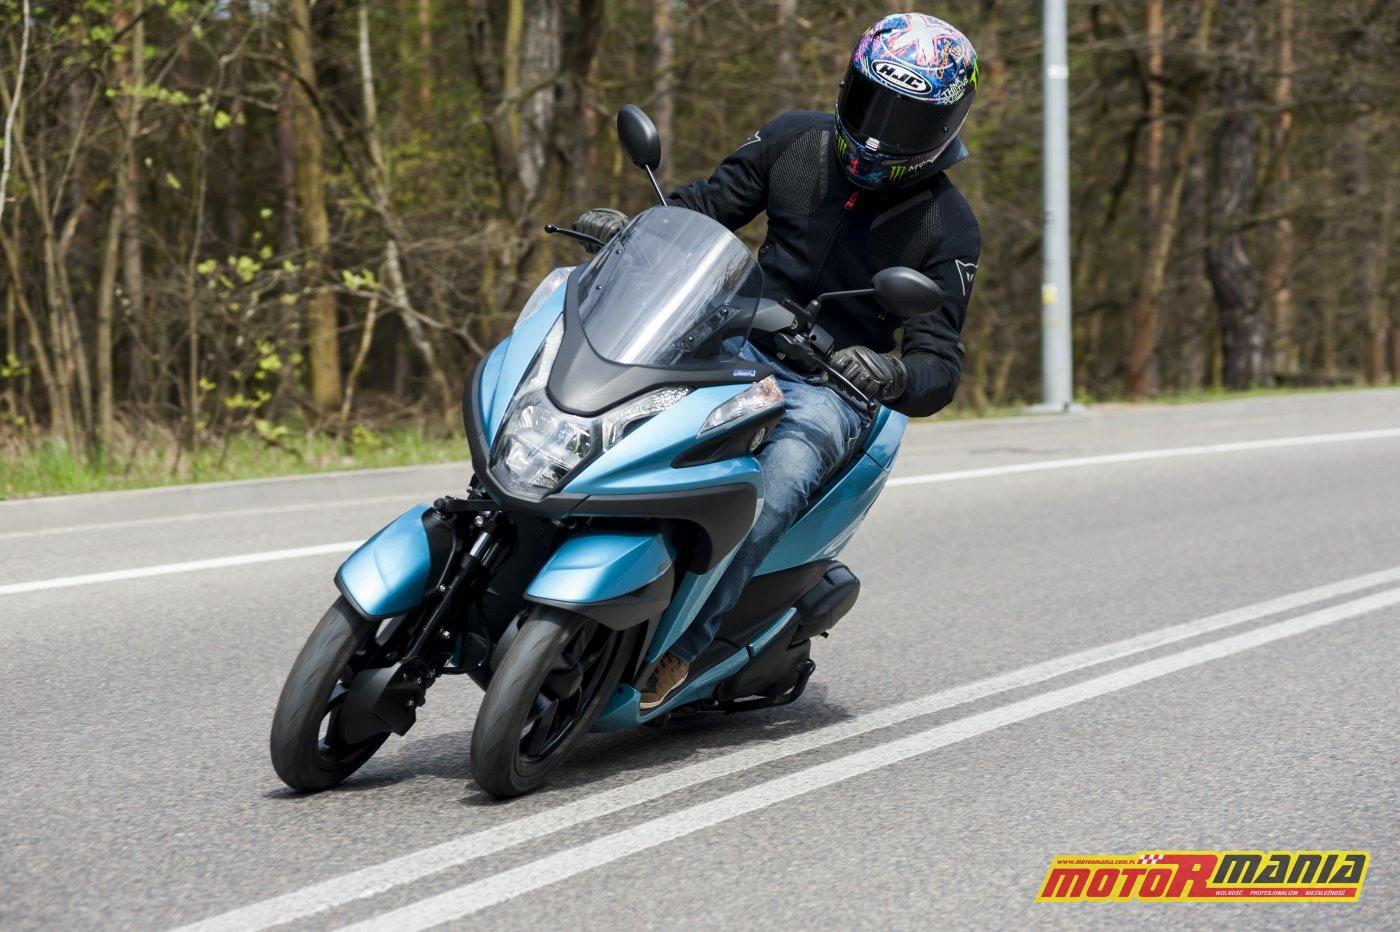 Yamaha Tricity 125 test motormania - fot Tomazi_pl (3)